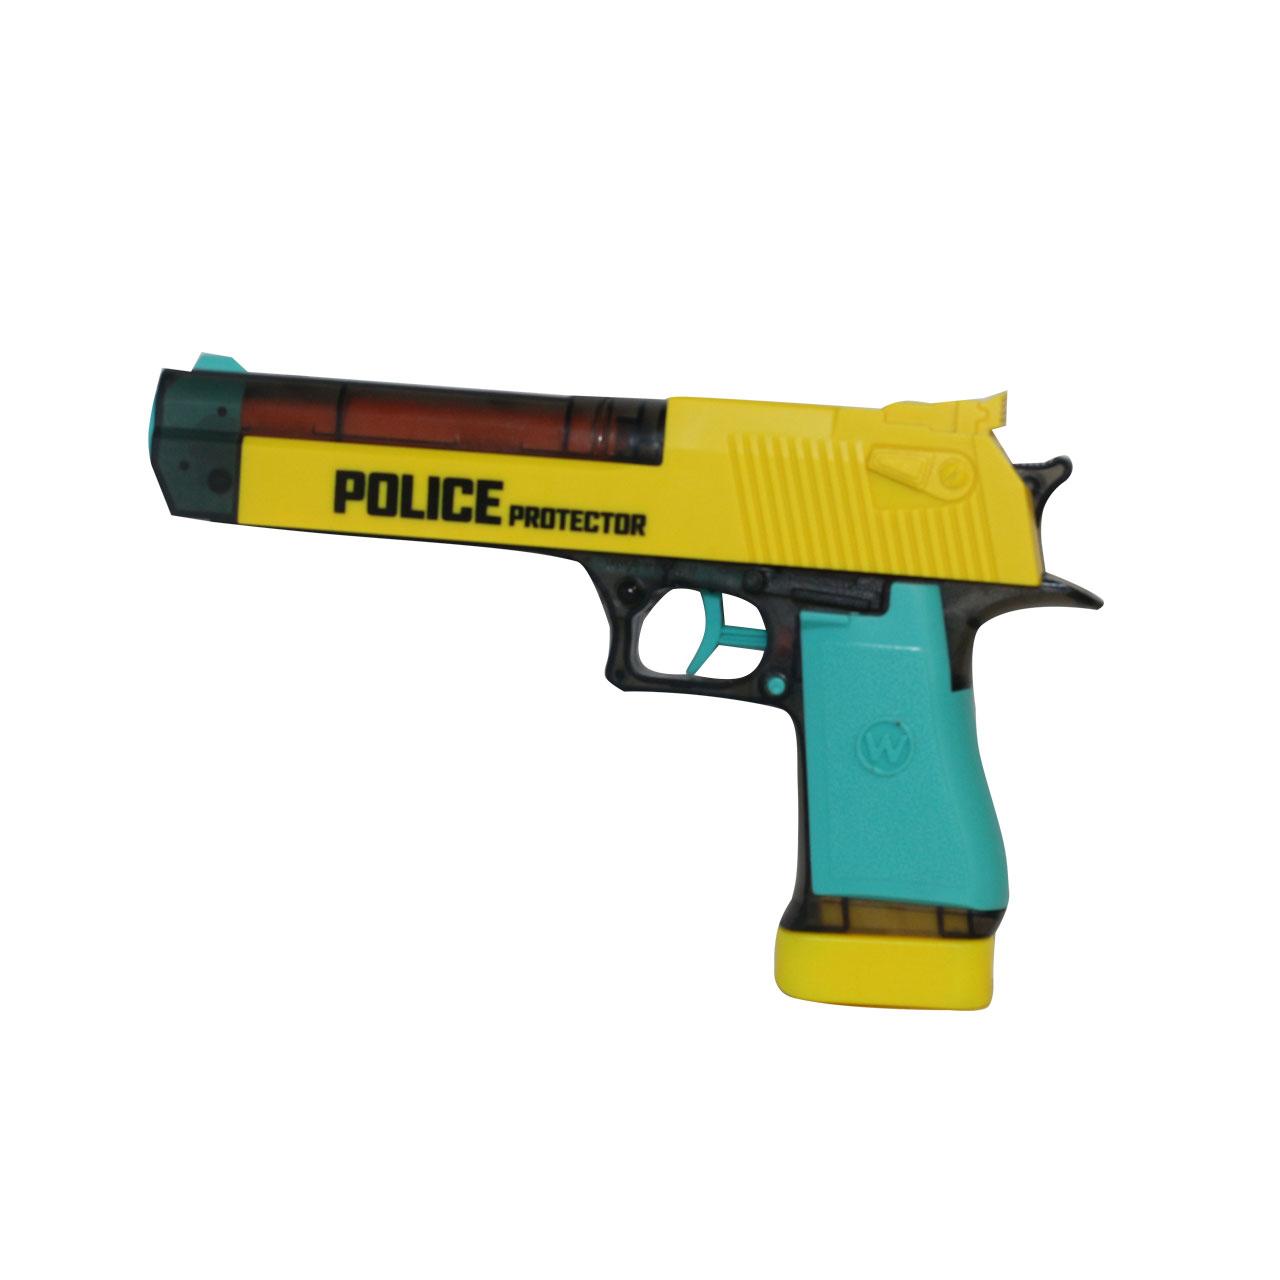 خرید                     تفنگ بازی جی ای تویز طرح کلت پلیس کد 64837